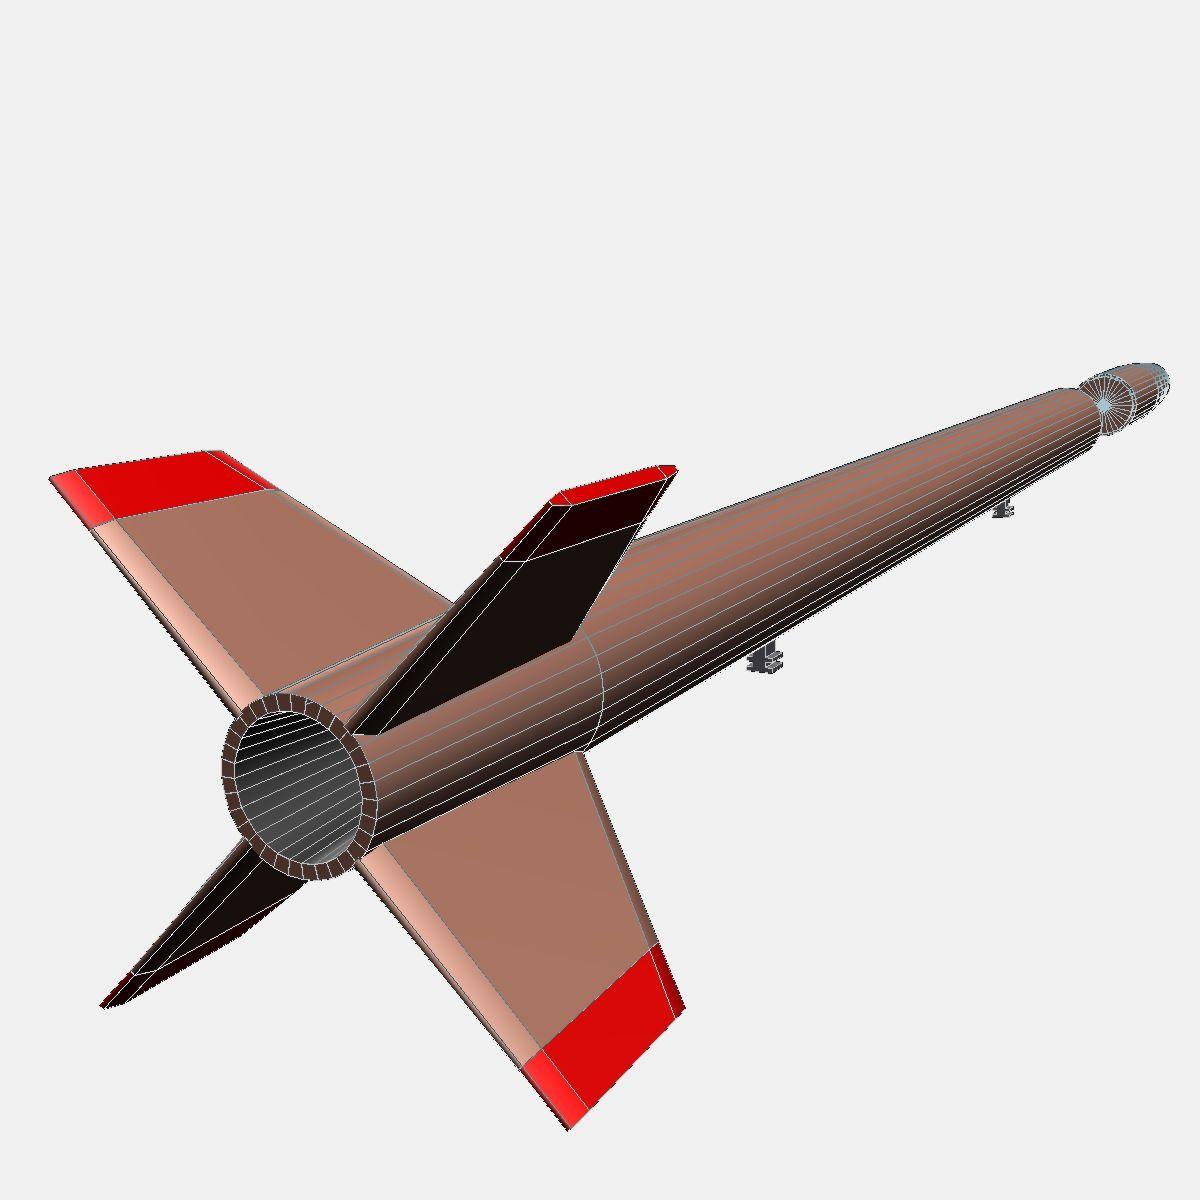 Japanese MT-135 Rocket 3d model 3ds dxf fbx blend cob dae X  obj 158760